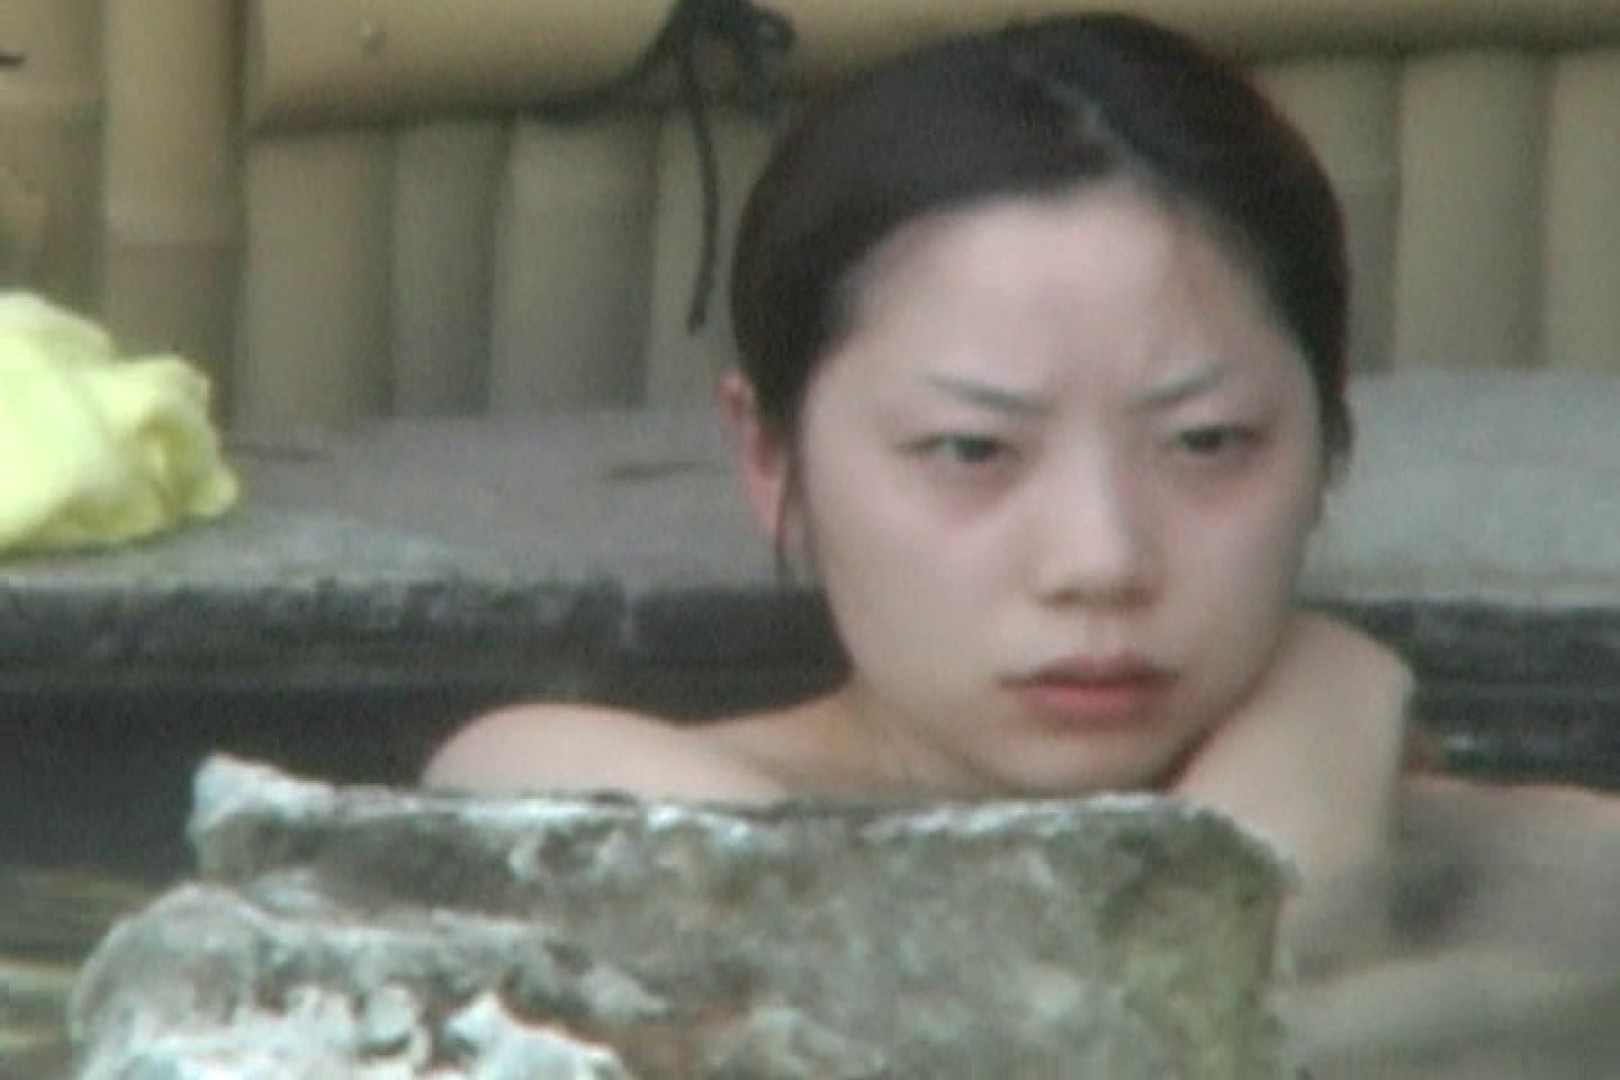 Aquaな露天風呂Vol.596 盗撮シリーズ | 露天風呂編  113PIX 113